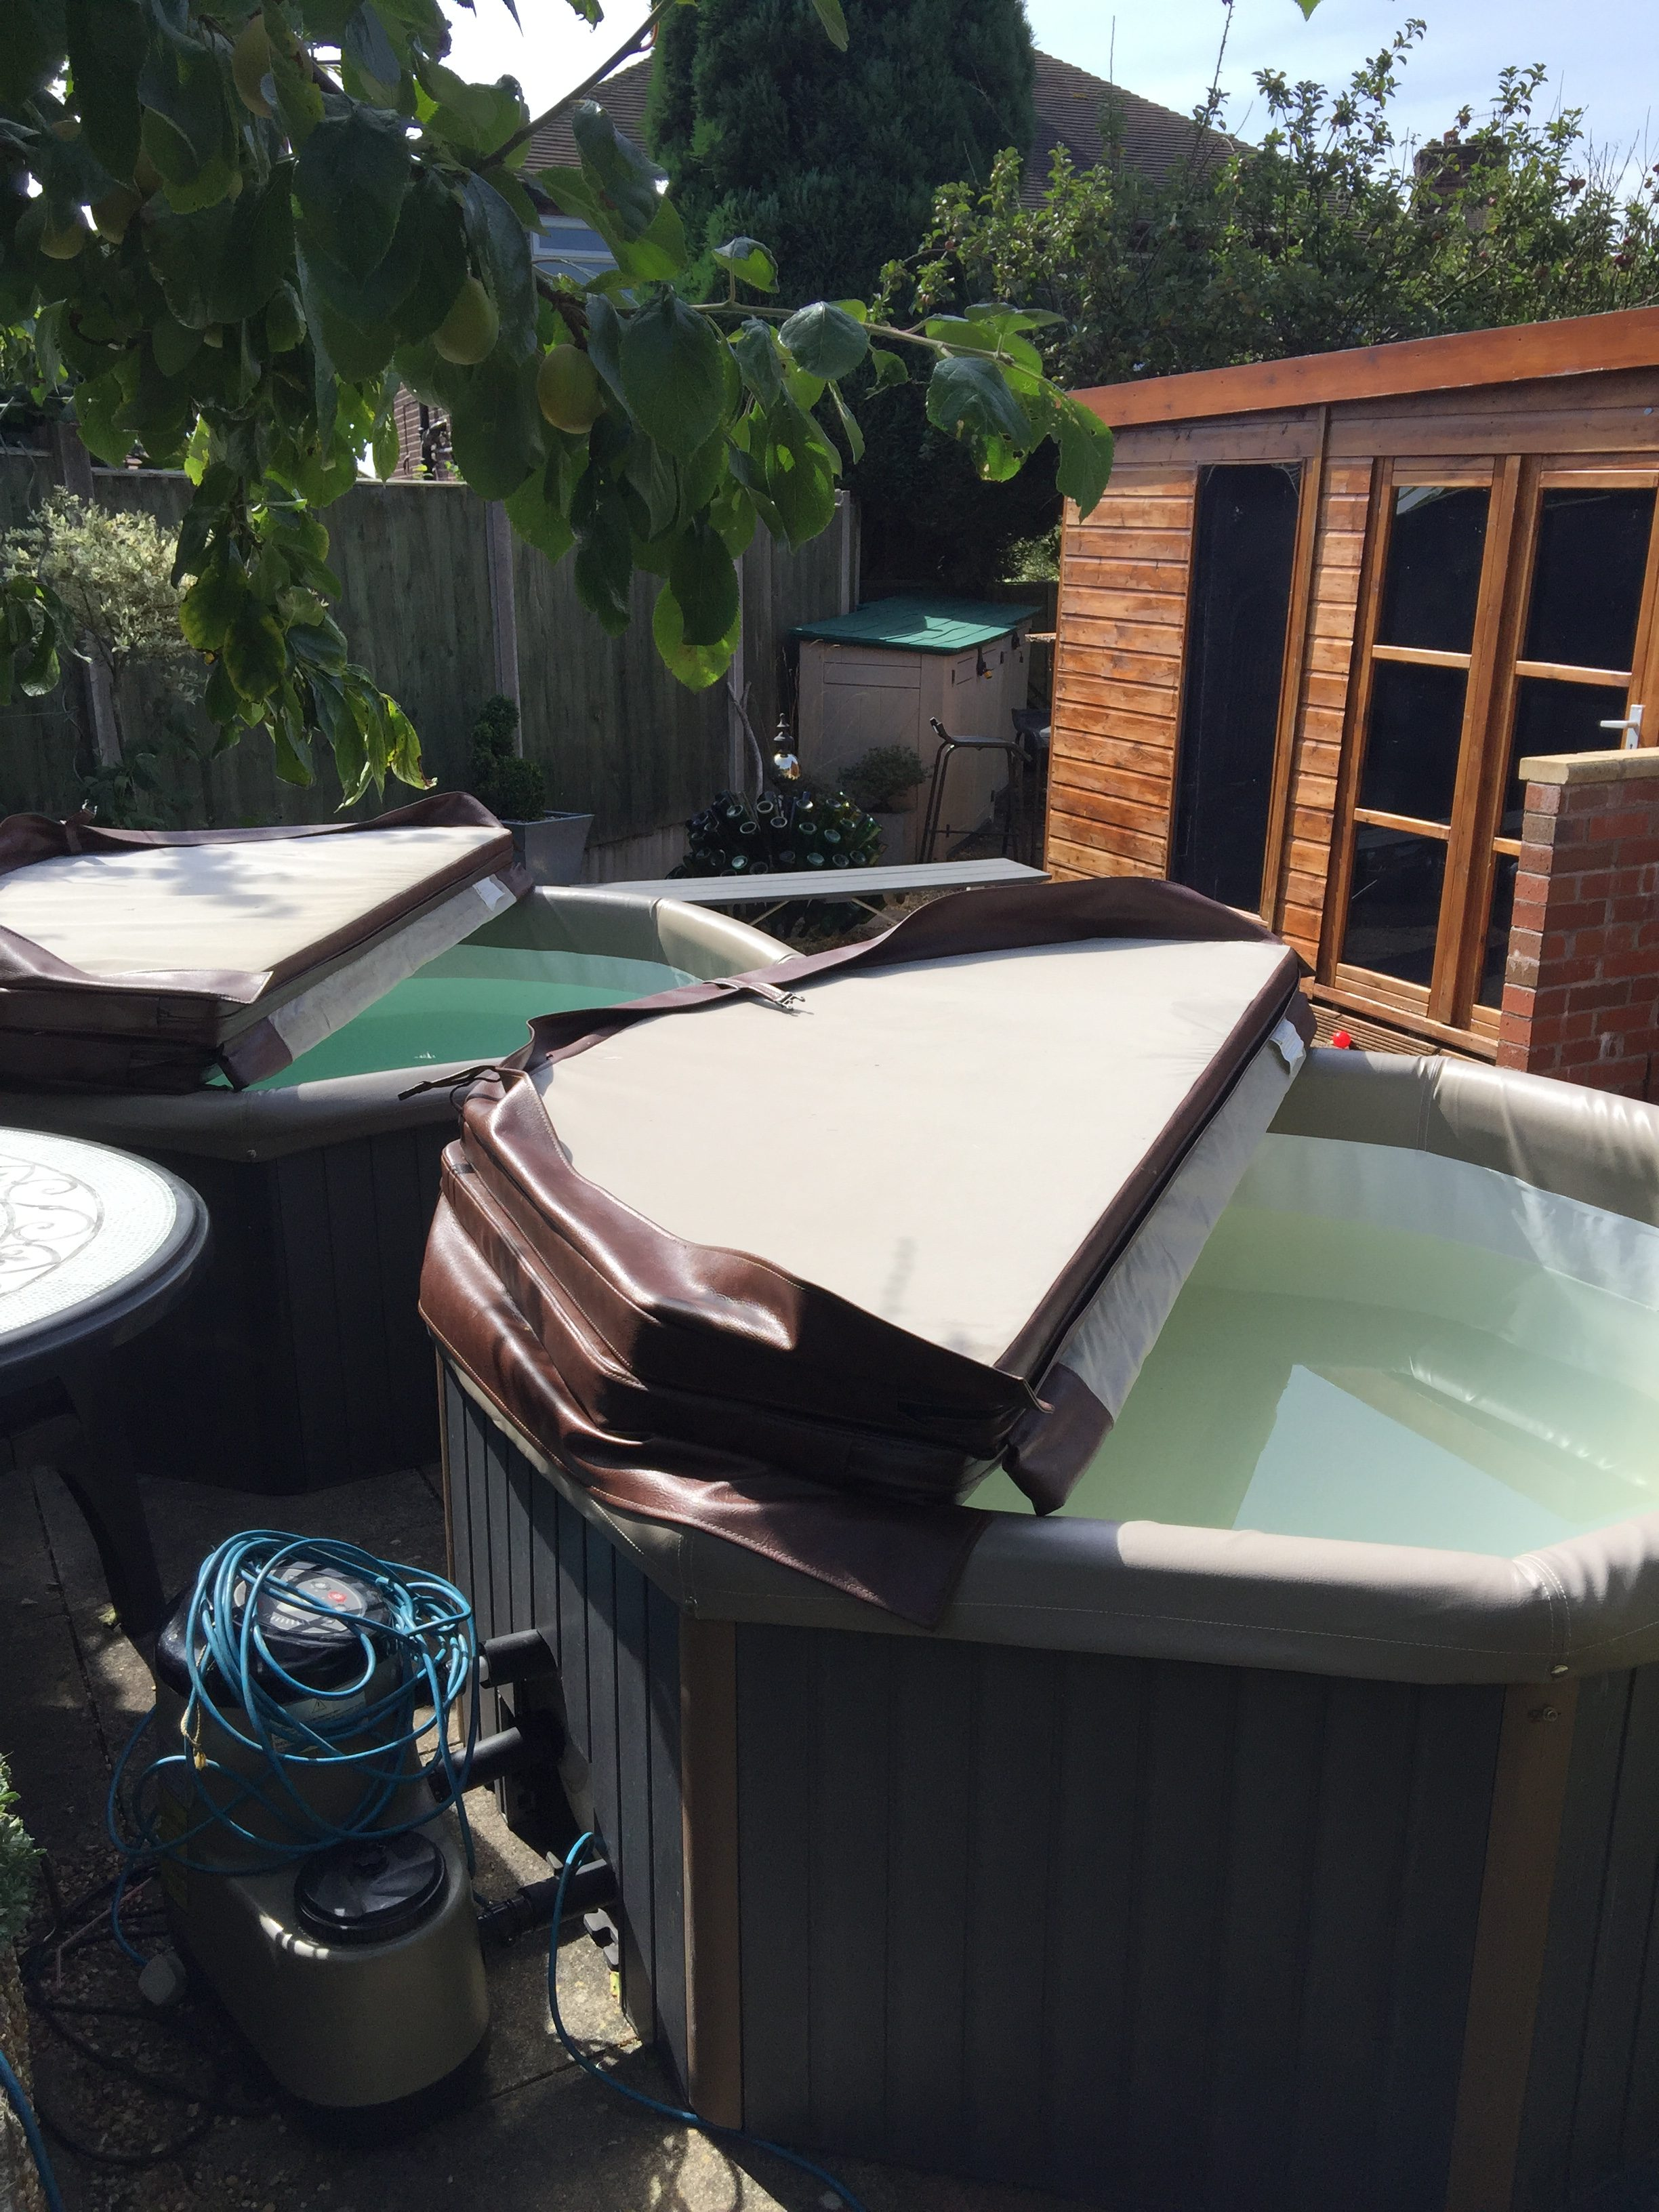 Belper Hot Tub Hire, Cheap, Local Hot Tub Rental Belper, Derby